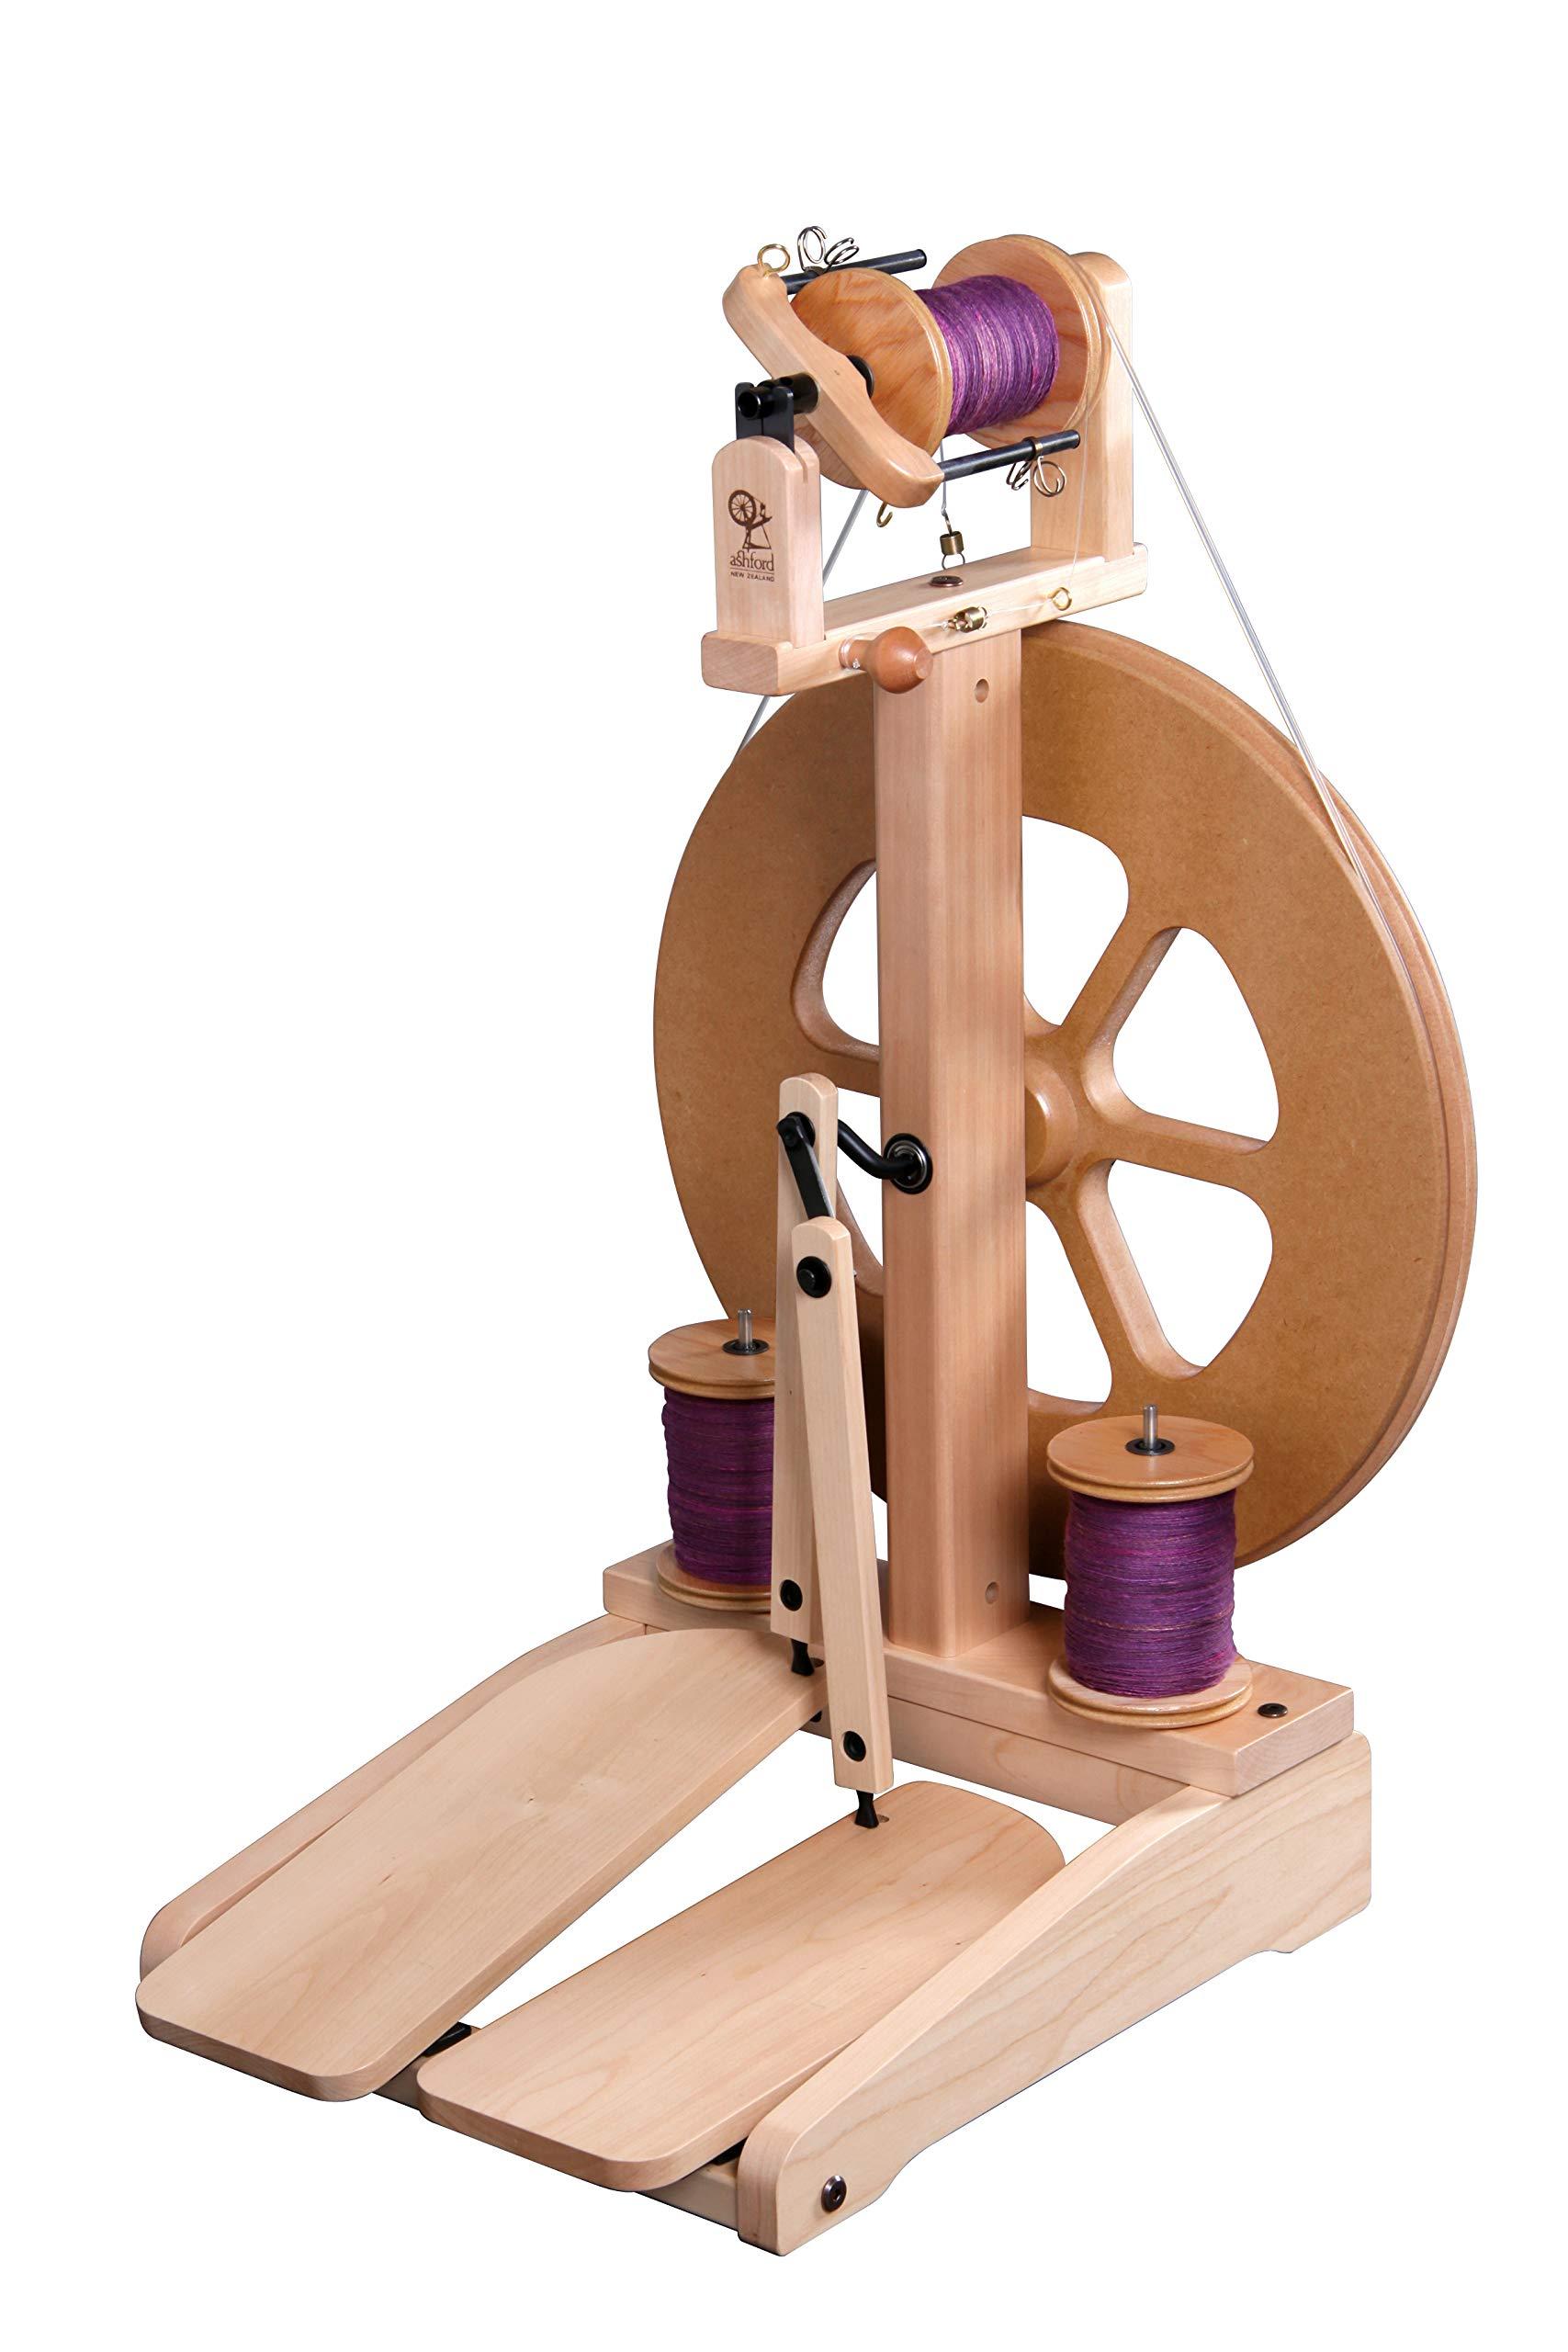 Ashford Kiwi Spinning Wheel 2 - Lacquered by Ashford (Image #1)